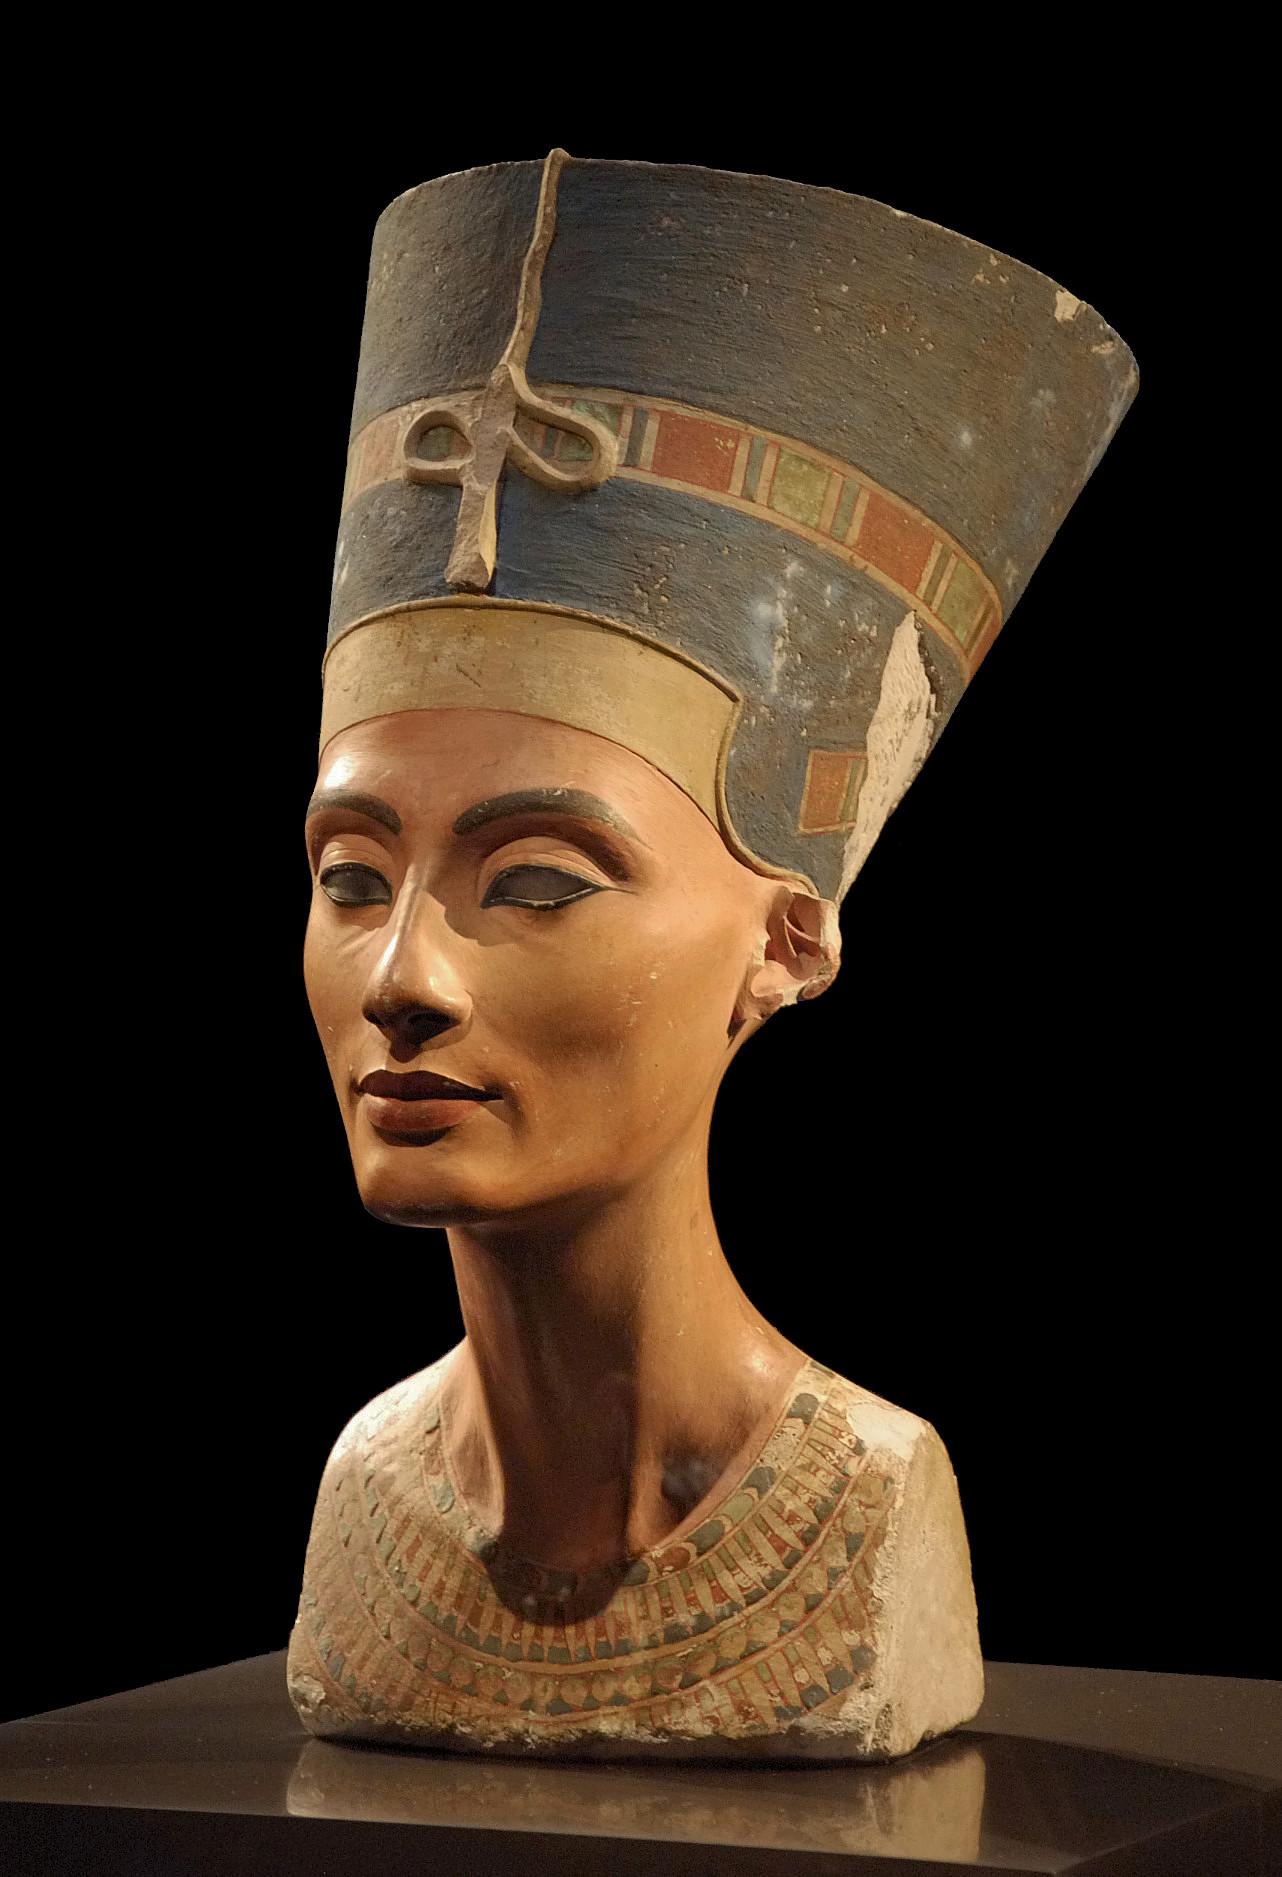 Figure 8, bust of Nefertiti, Neues Museum, Berlin (CC-0)